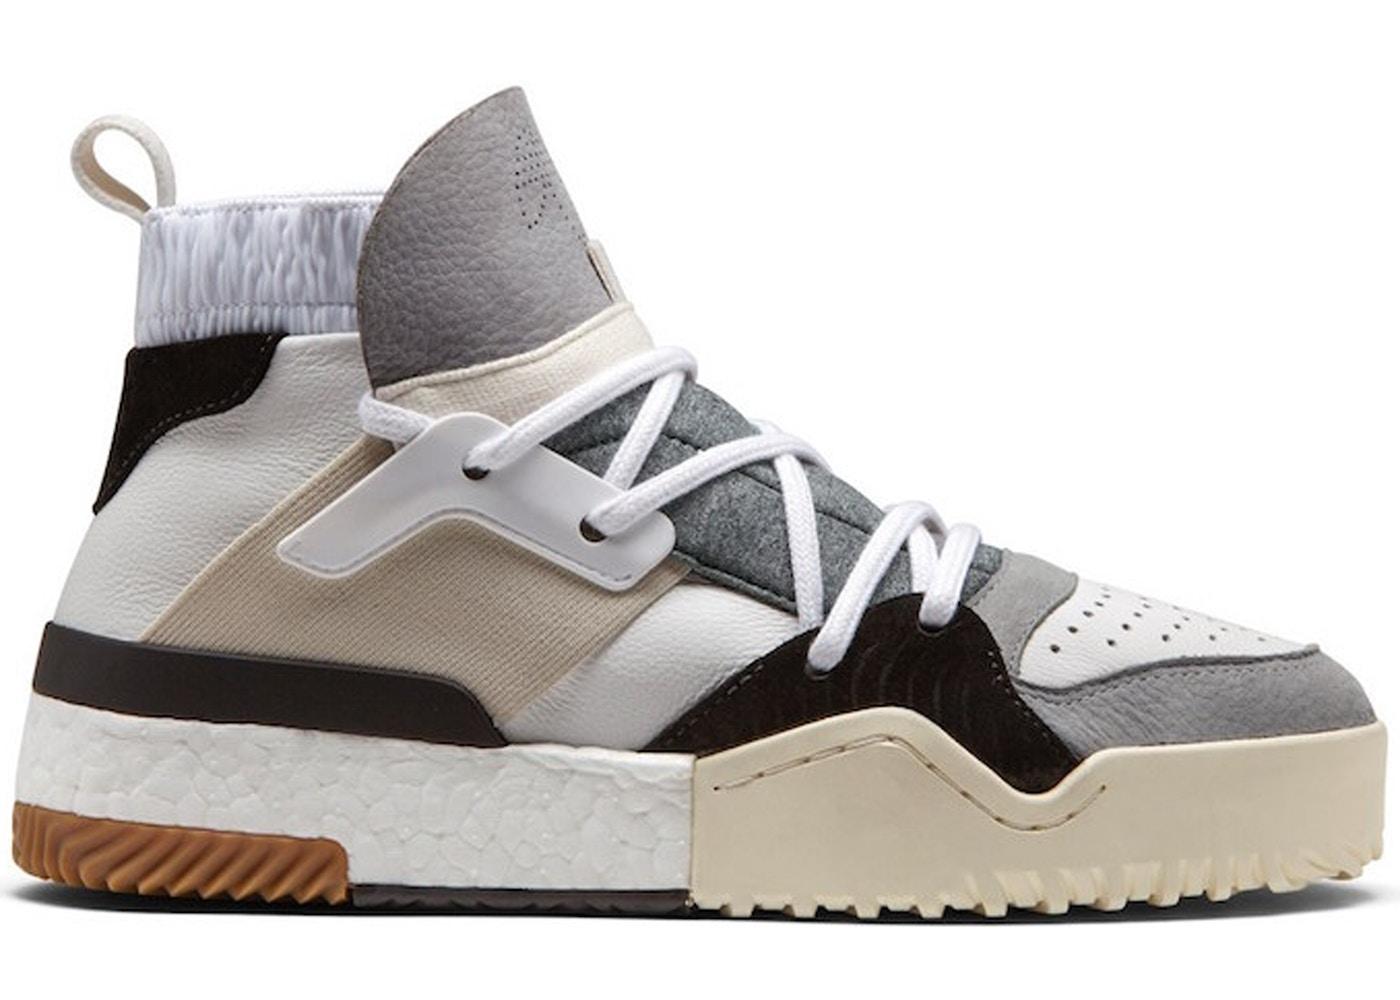 sports shoes 6c675 9a355 Wang Wang Cm7824 Cm7824 Cm7824 Adidas Aw Grey Alexander Bball Cream w47tpCq